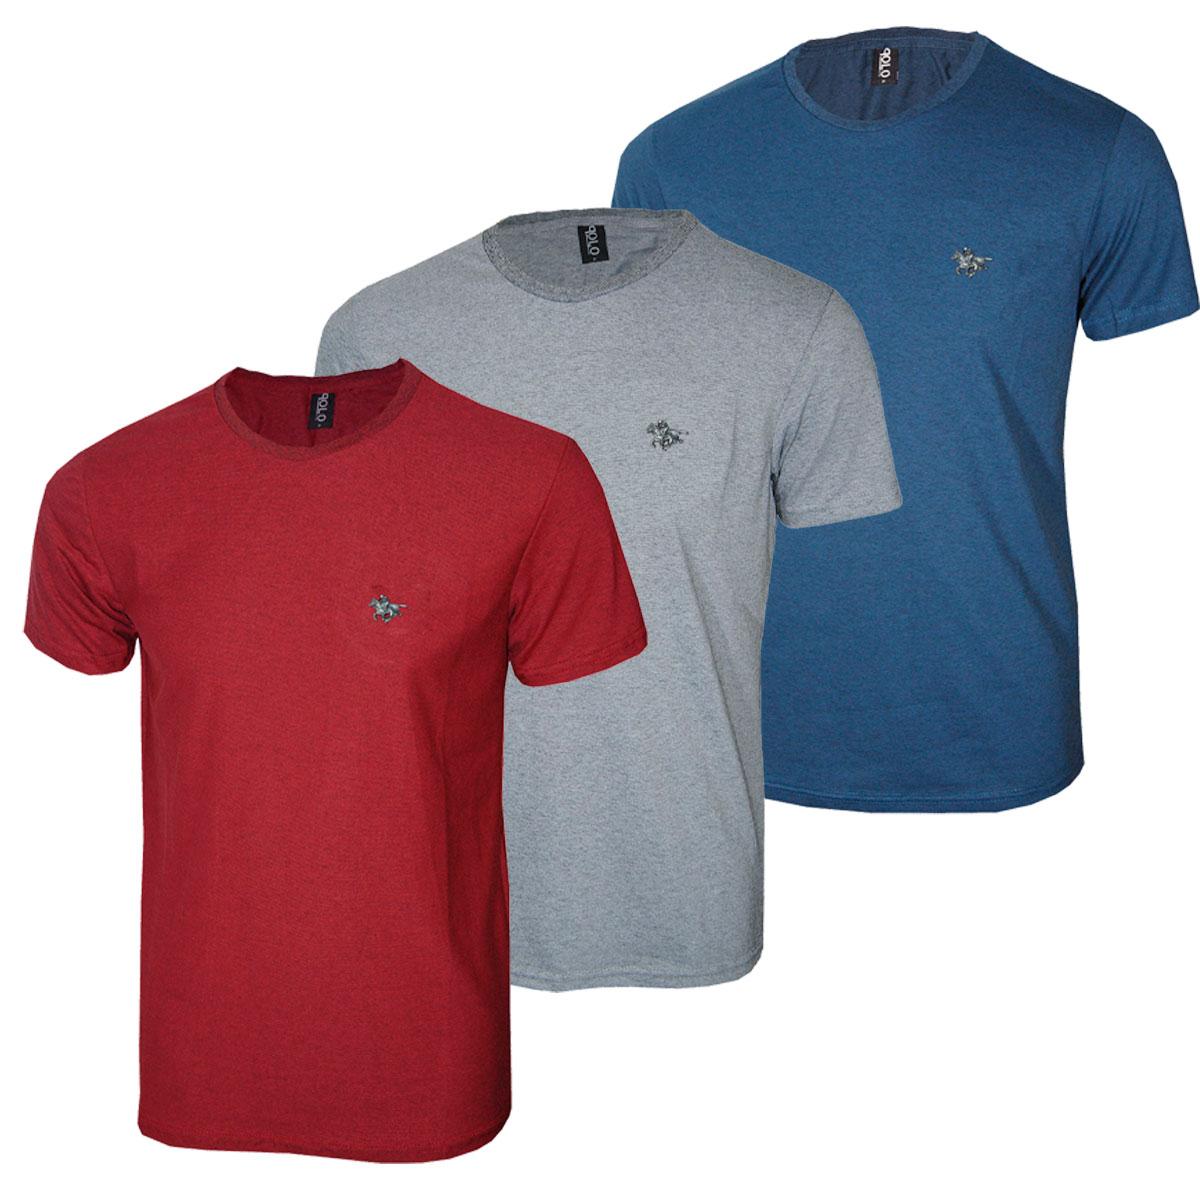 Kit Camiseta Masculina com Cavalo Metalizado